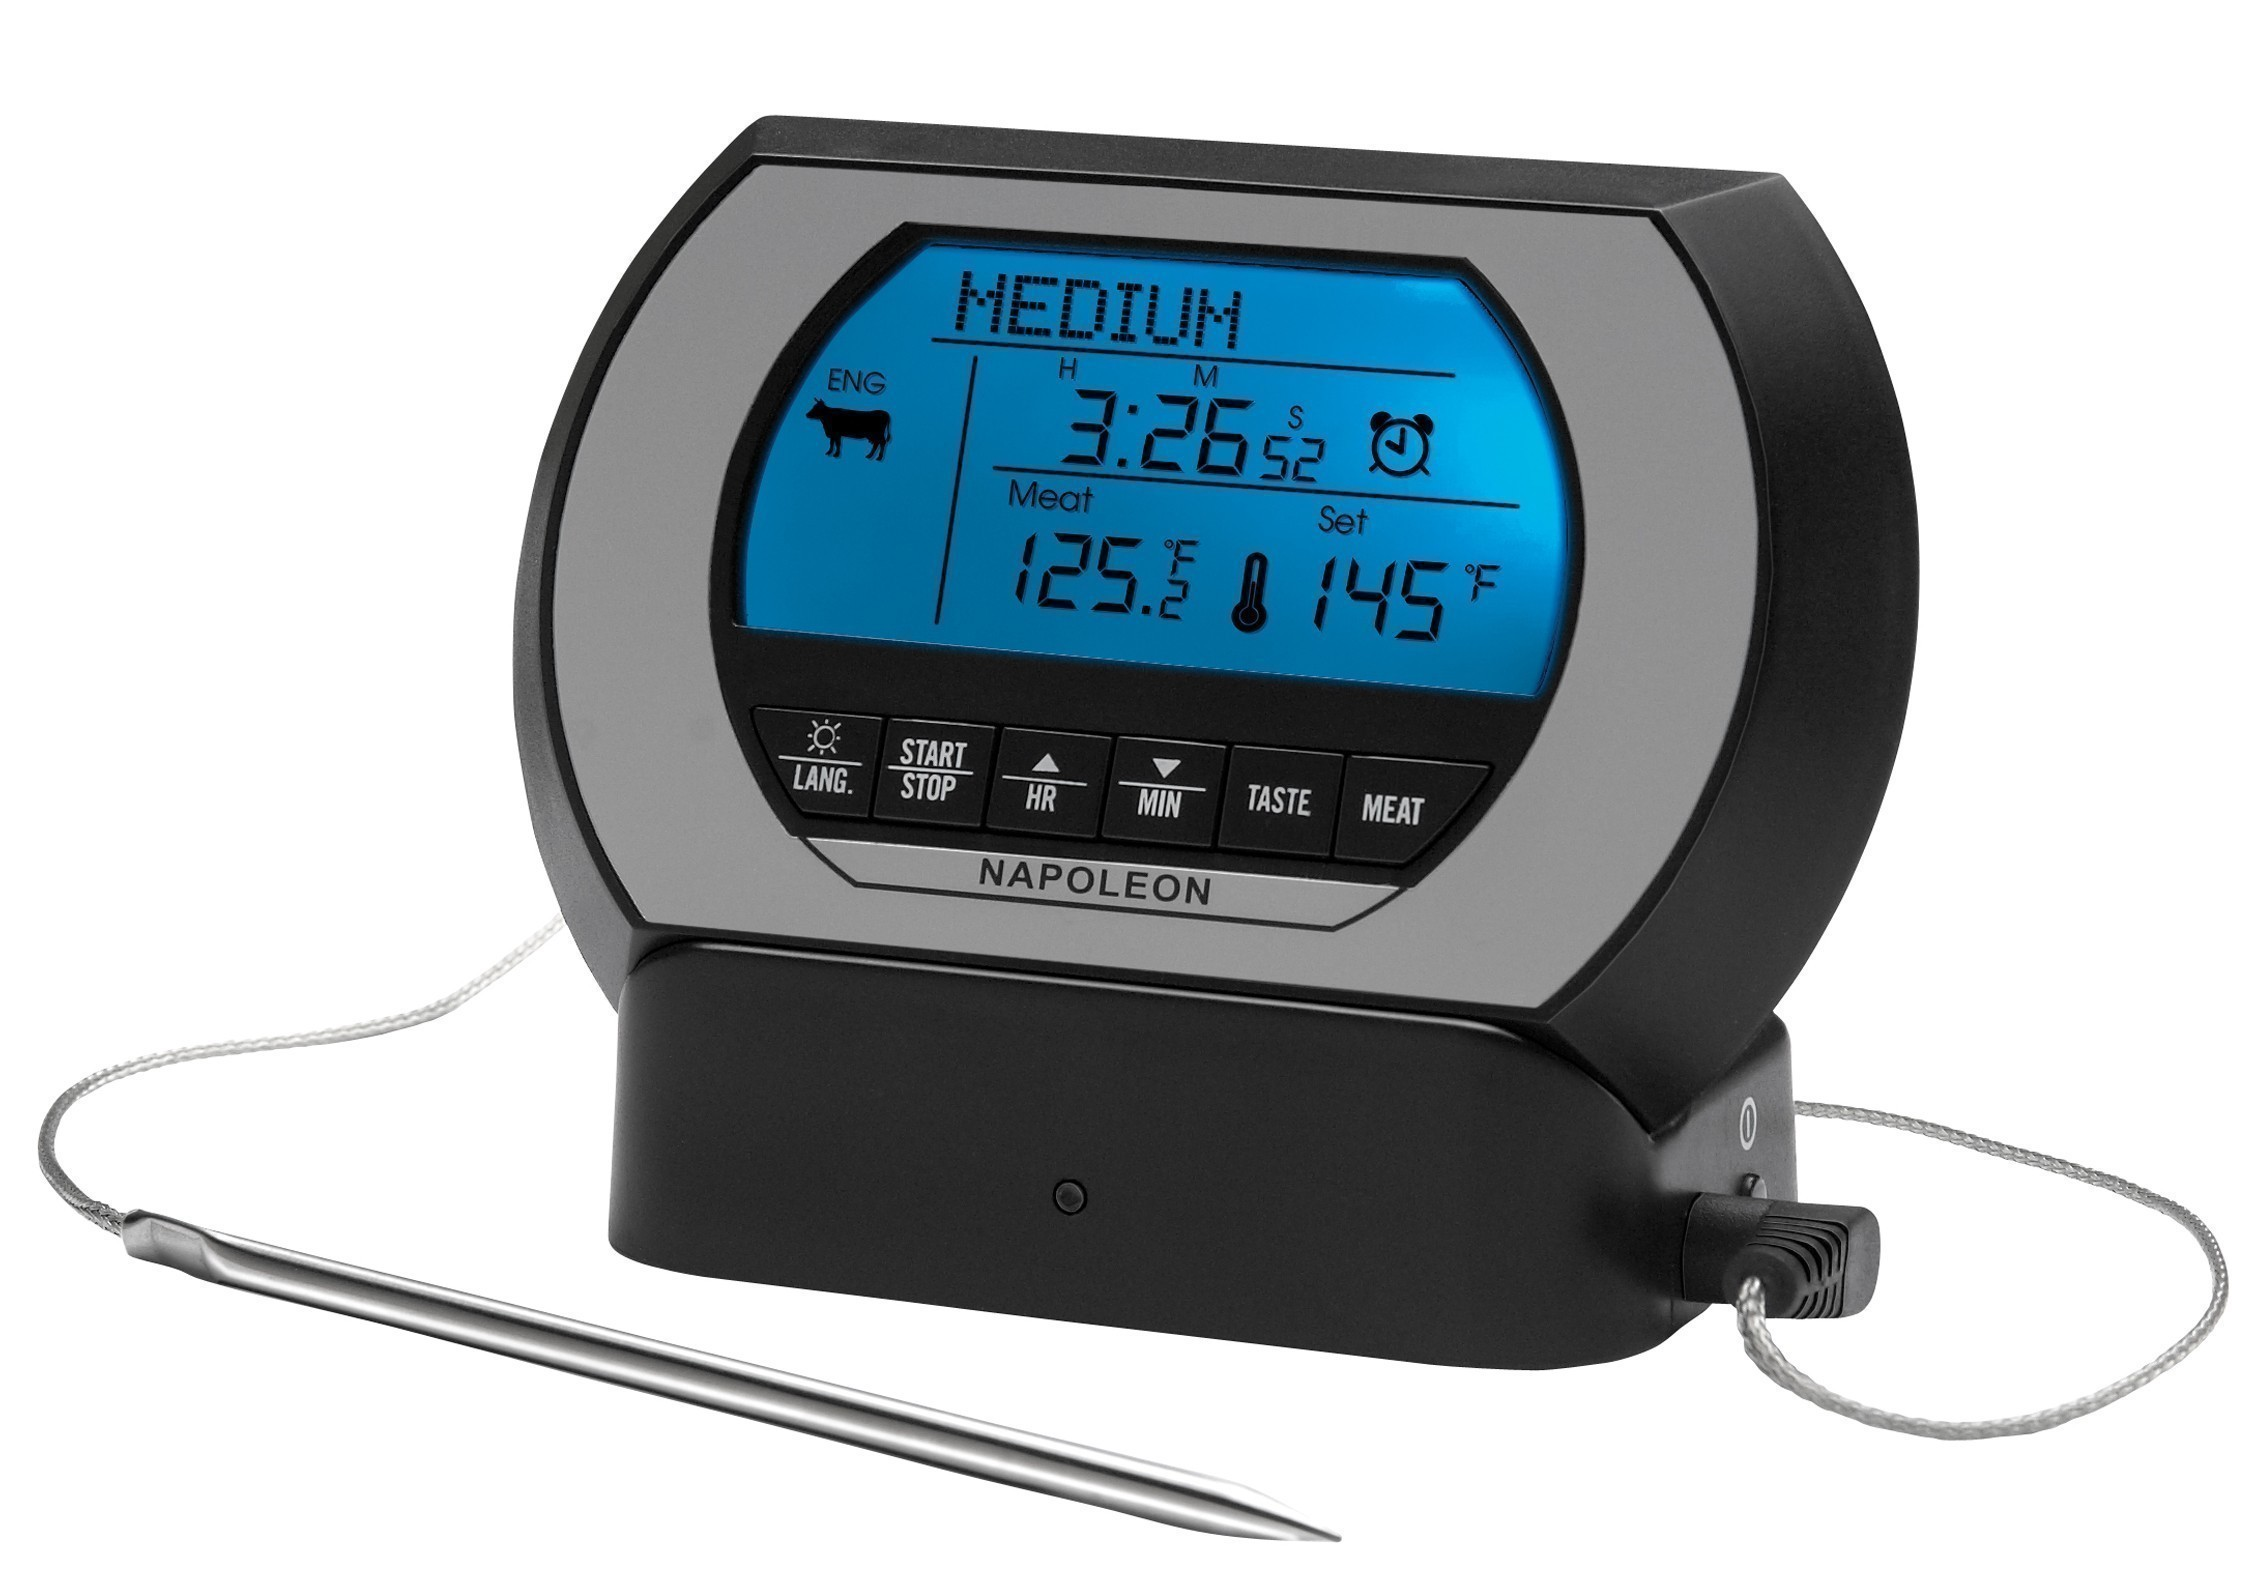 Funk Thermometer Grill : grill thermometer bratenthermometer napoleon pro funk bei ~ Watch28wear.com Haus und Dekorationen